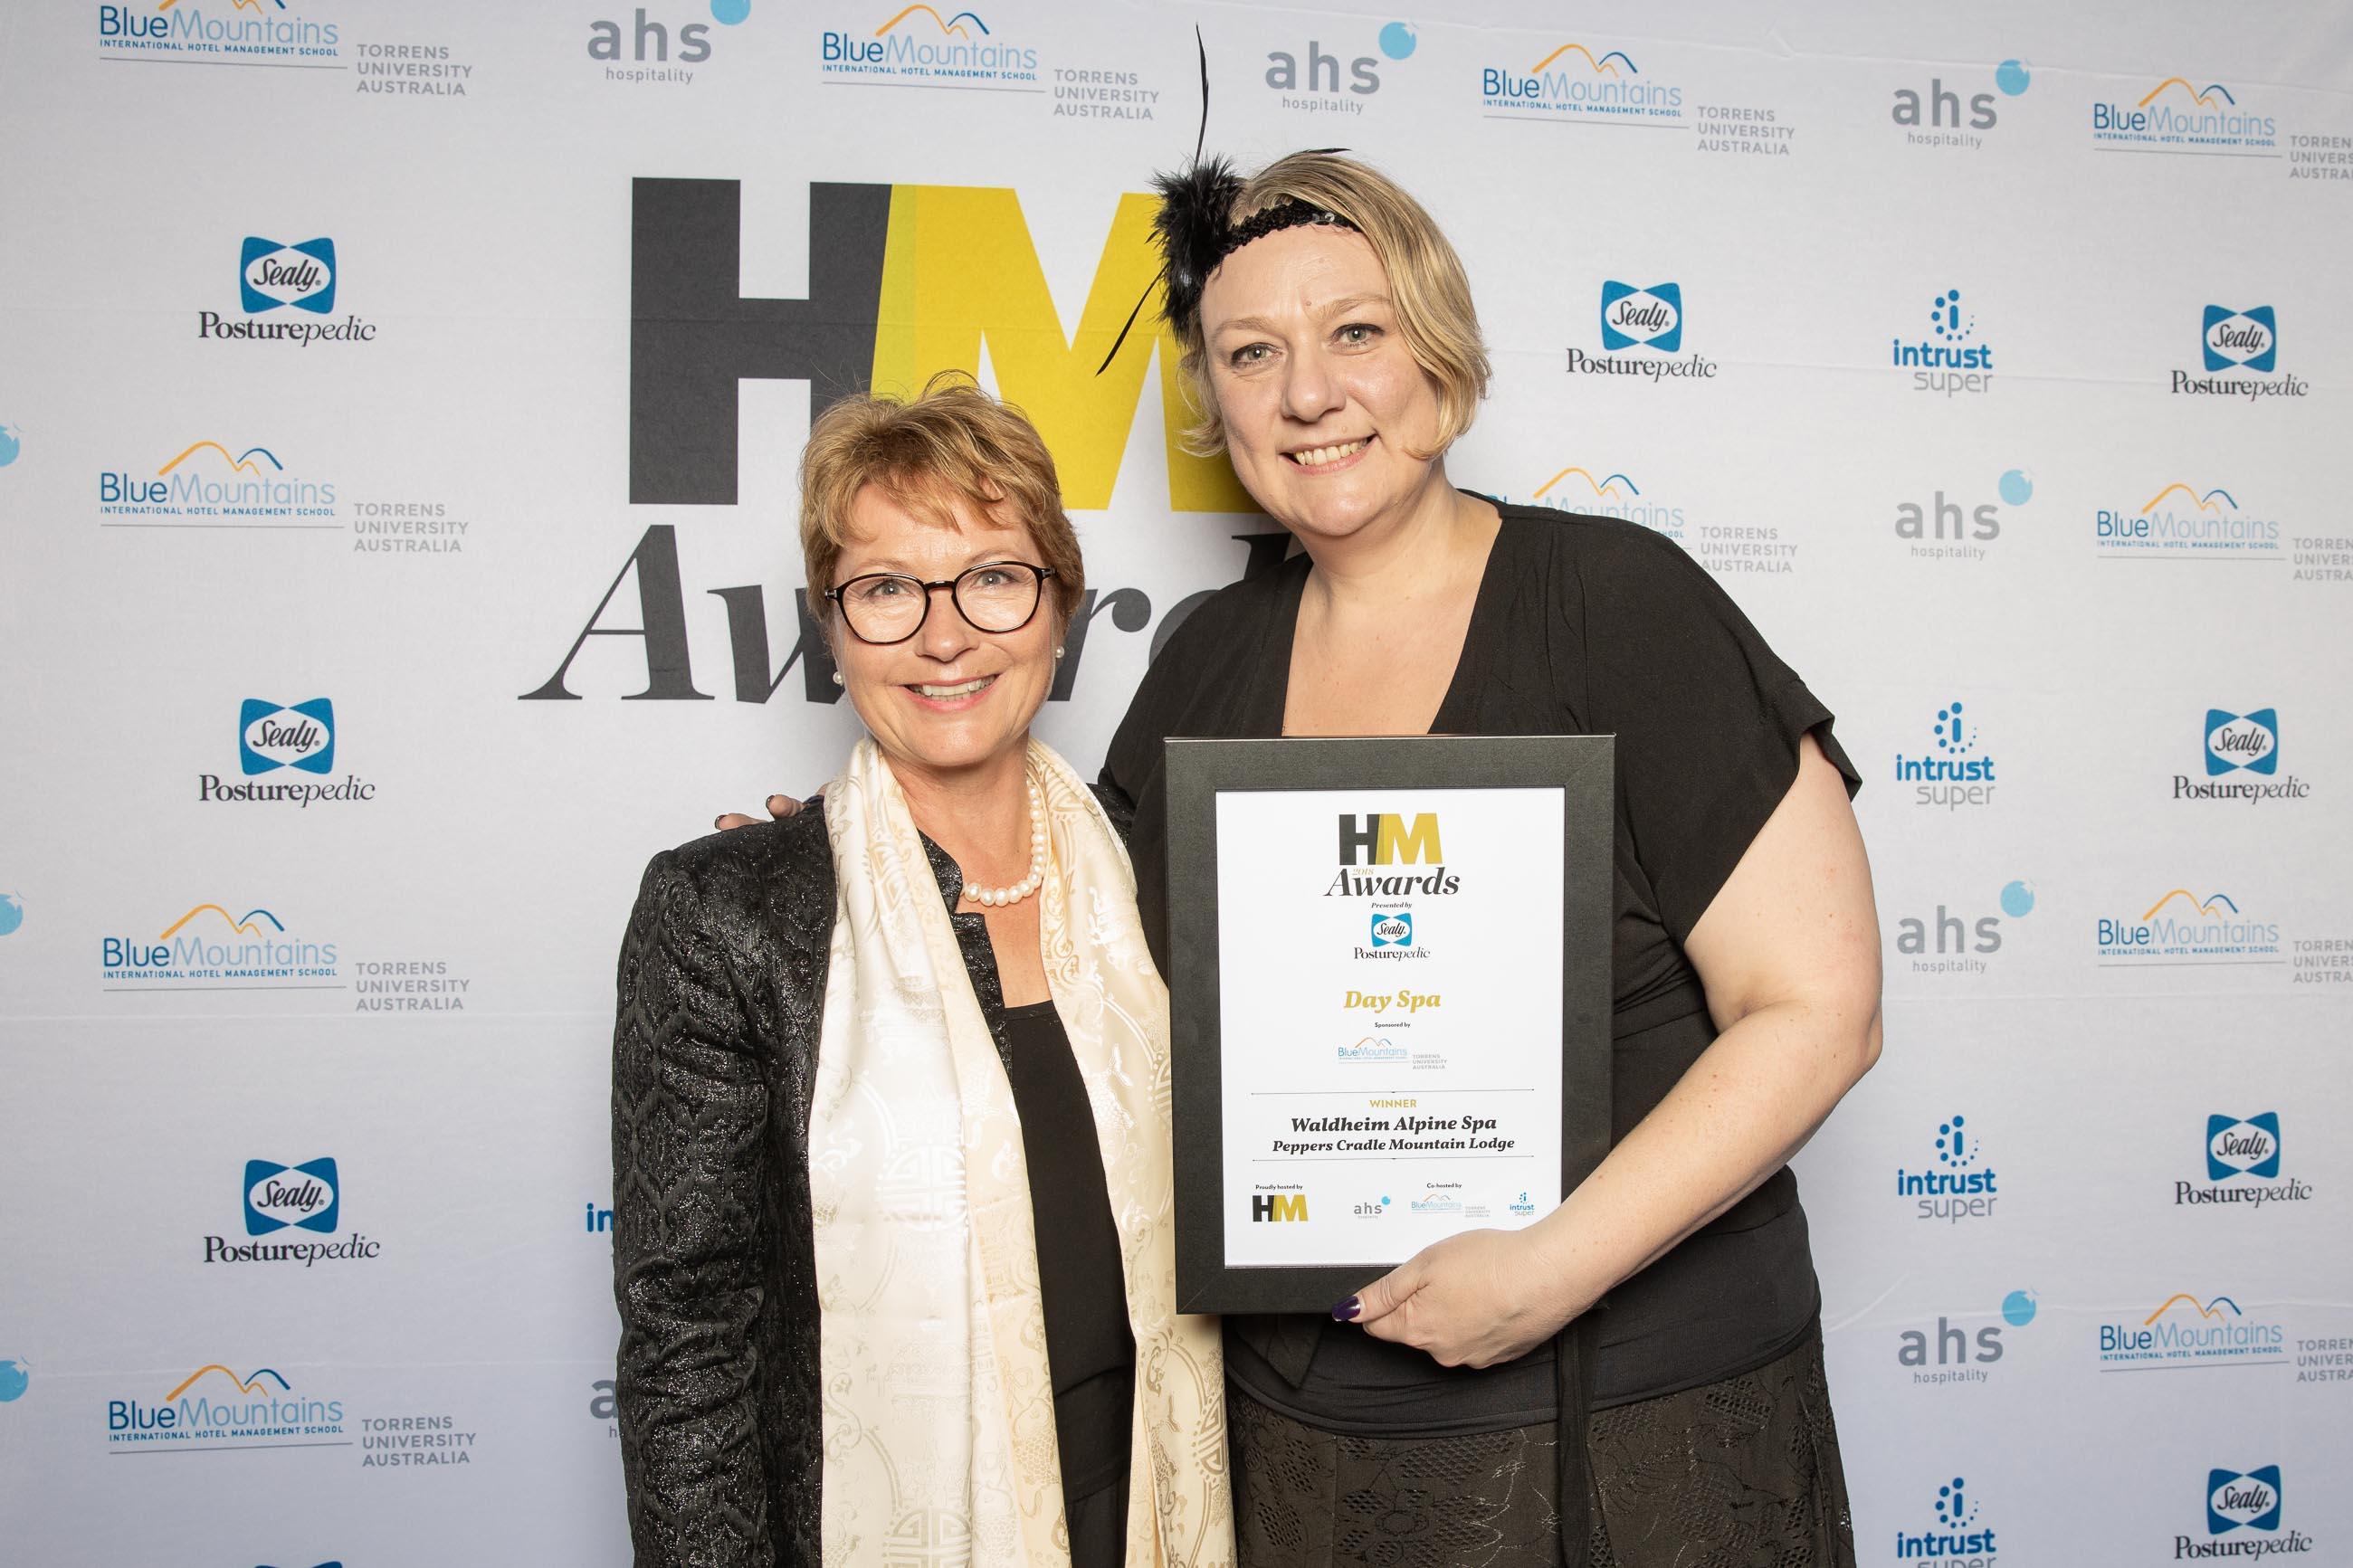 72ppi-HMawards-2018-official-award-wall-9393